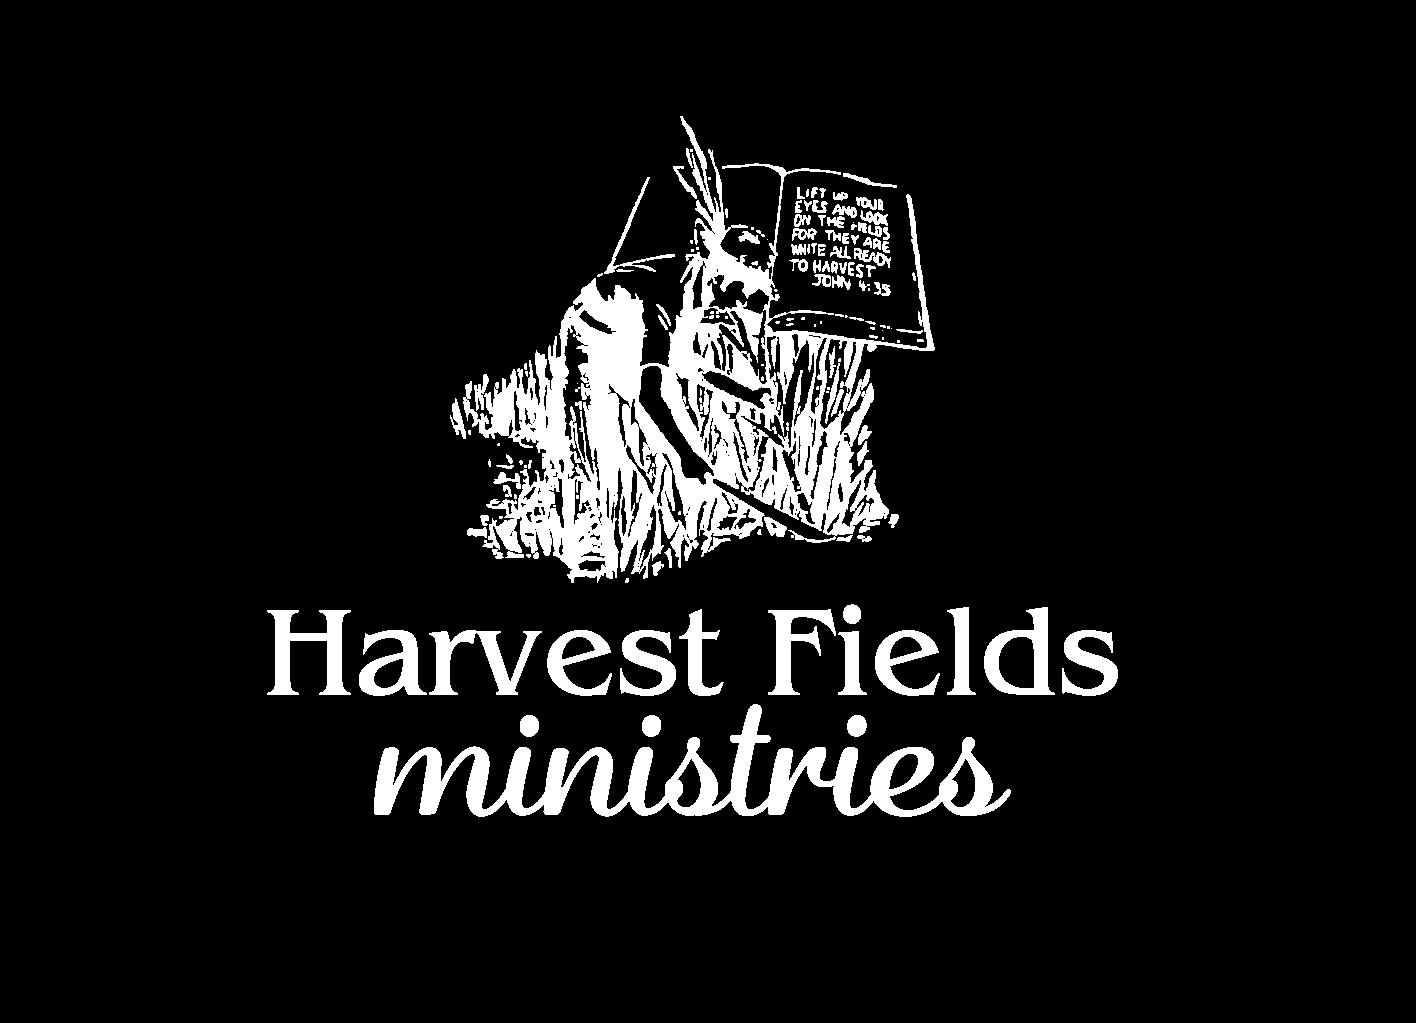 Harvest Fields Ministries